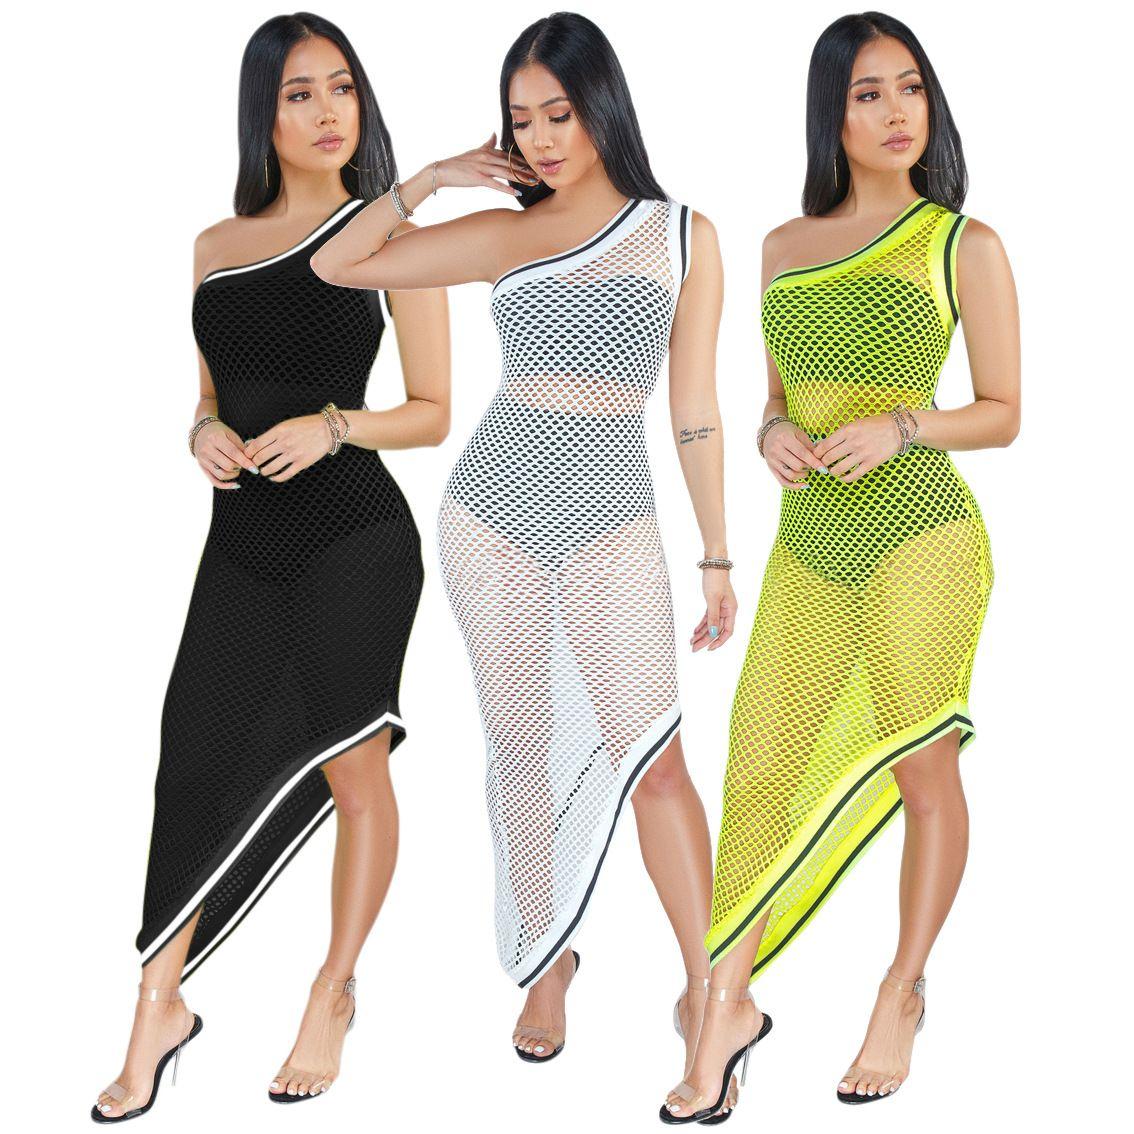 0bb05494854f3 2019 One Shoulder Bikini Cover Up Women Sexy Asymmetrical Maxi Beach  Dresses Solid Mesh Sleeveless Sun Dress Swim Wear White Black Yellow From  Hengytrade, ...